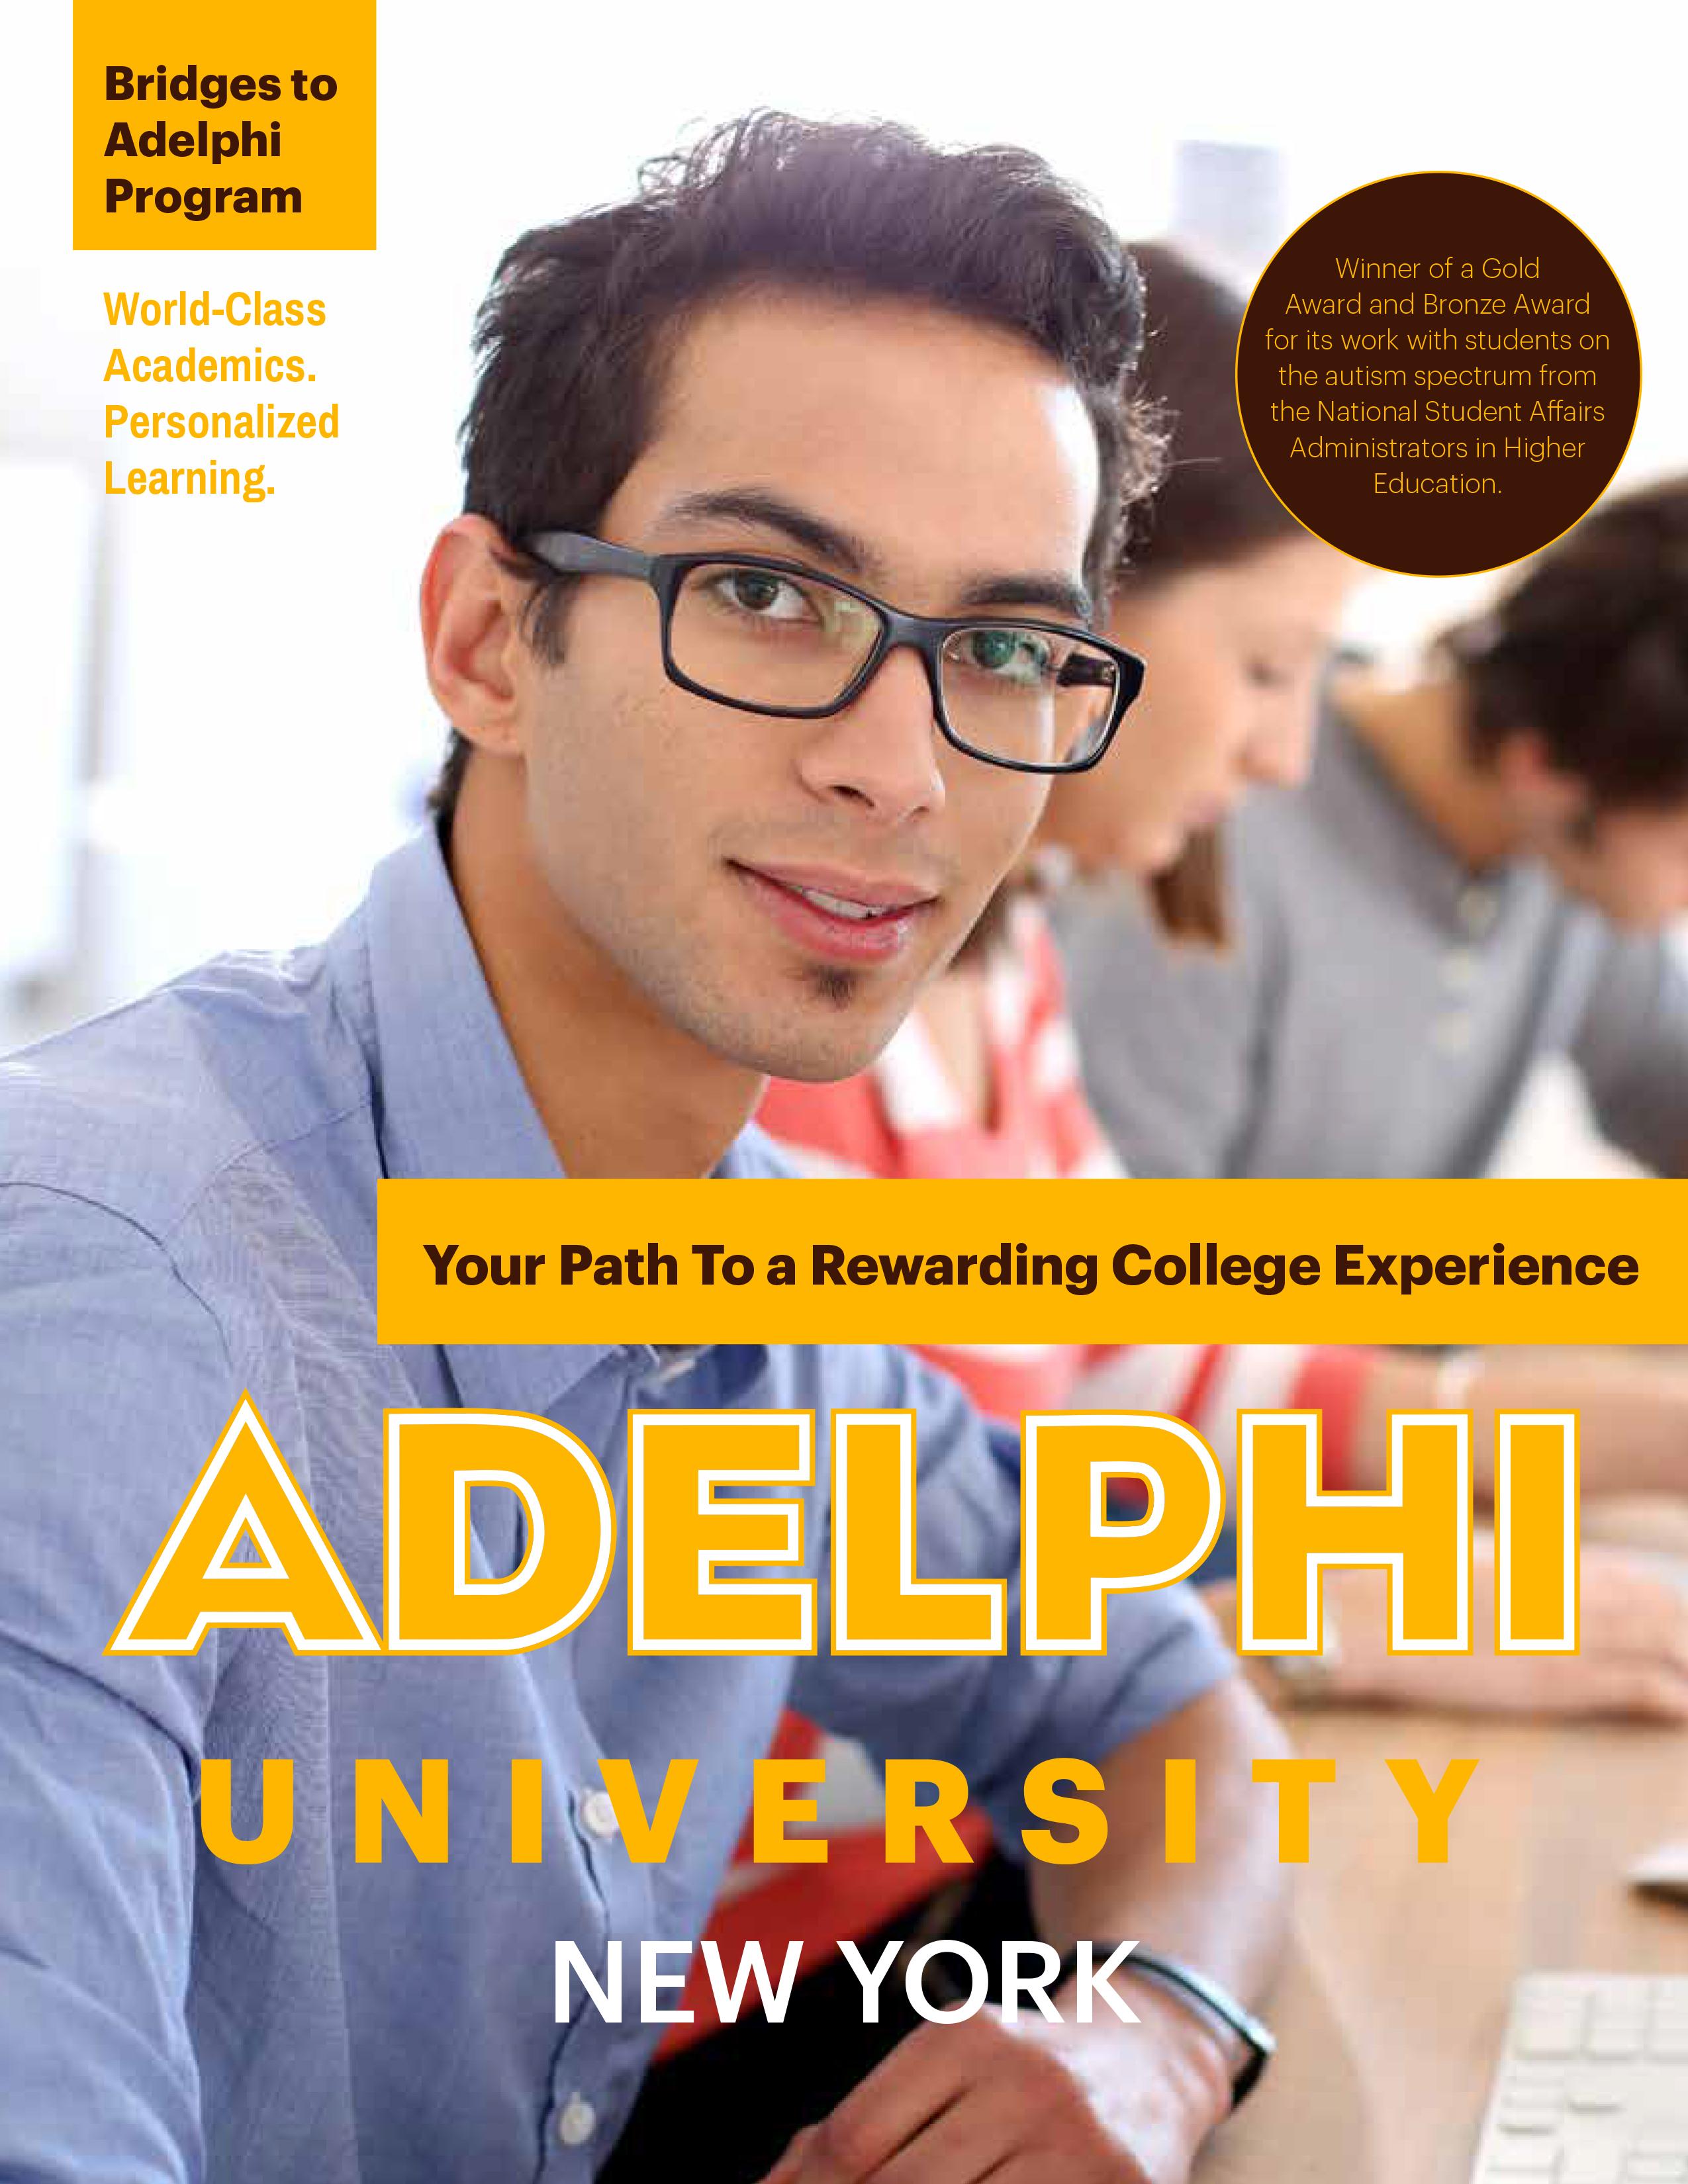 Adelphi Bridges Program